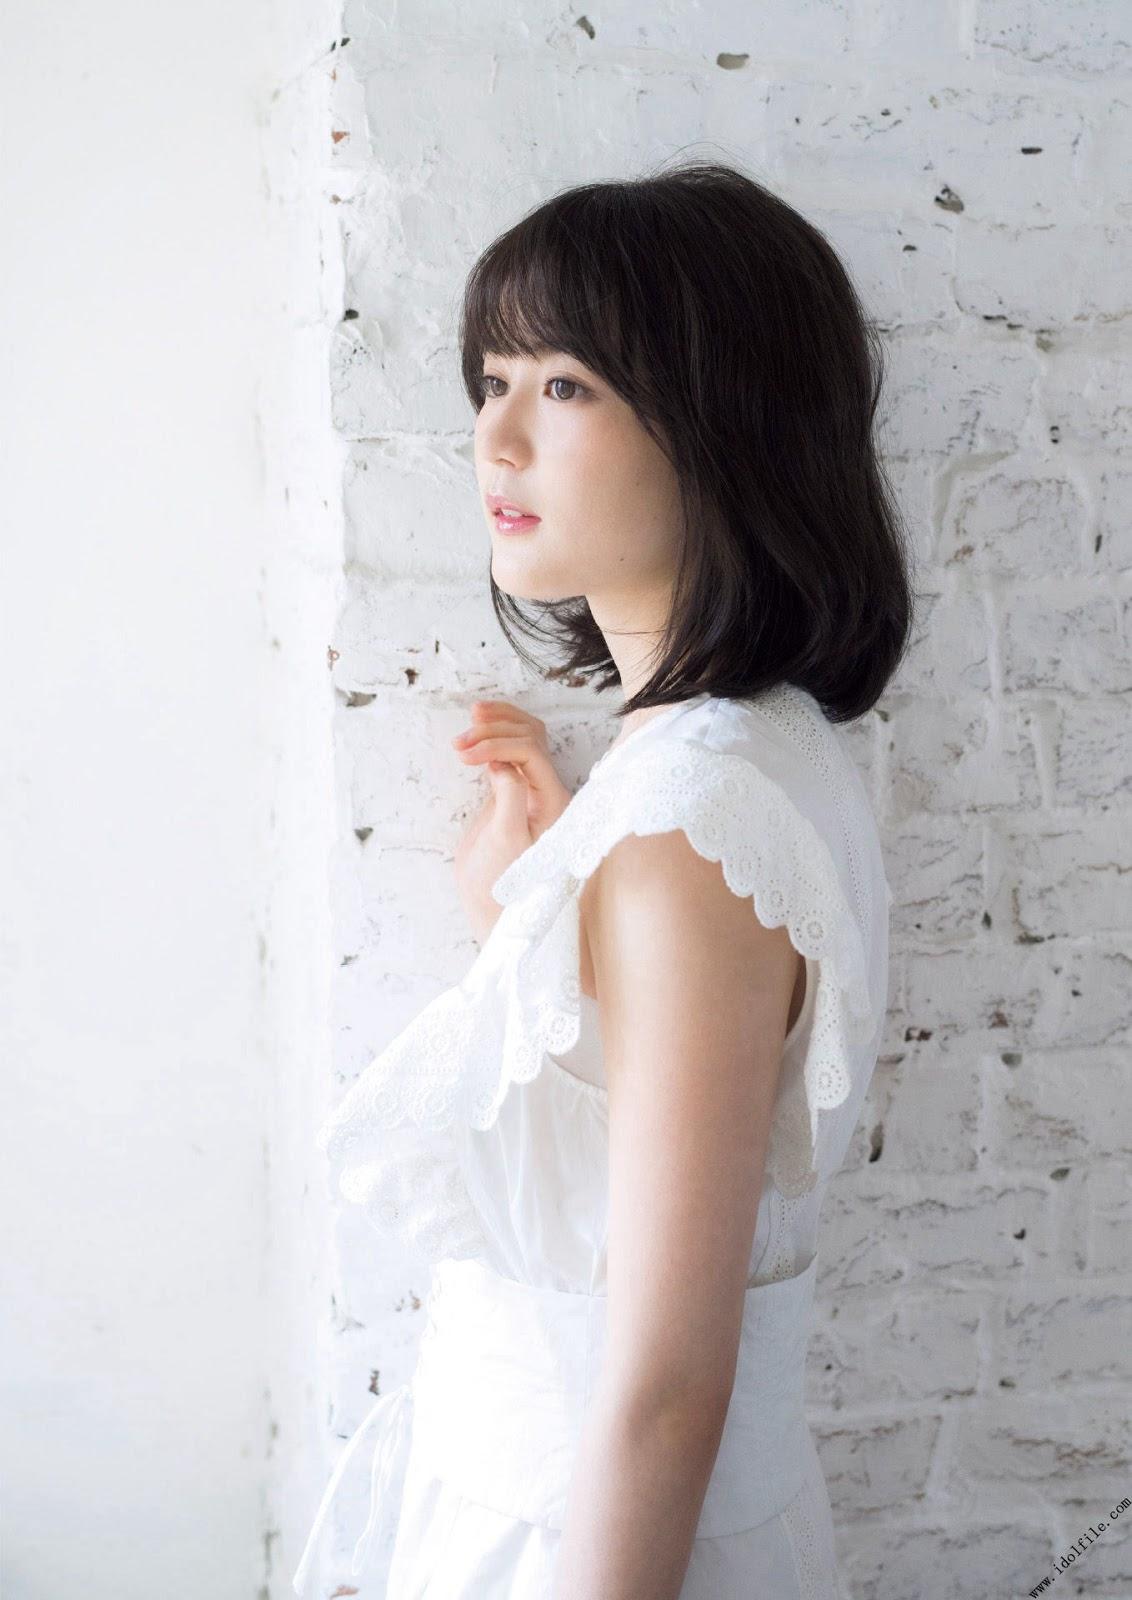 Ikoma Rina 生駒里奈, Ikuta Erika 生田絵梨花, FLASHスペシャルグラビアBEST 2018GW号